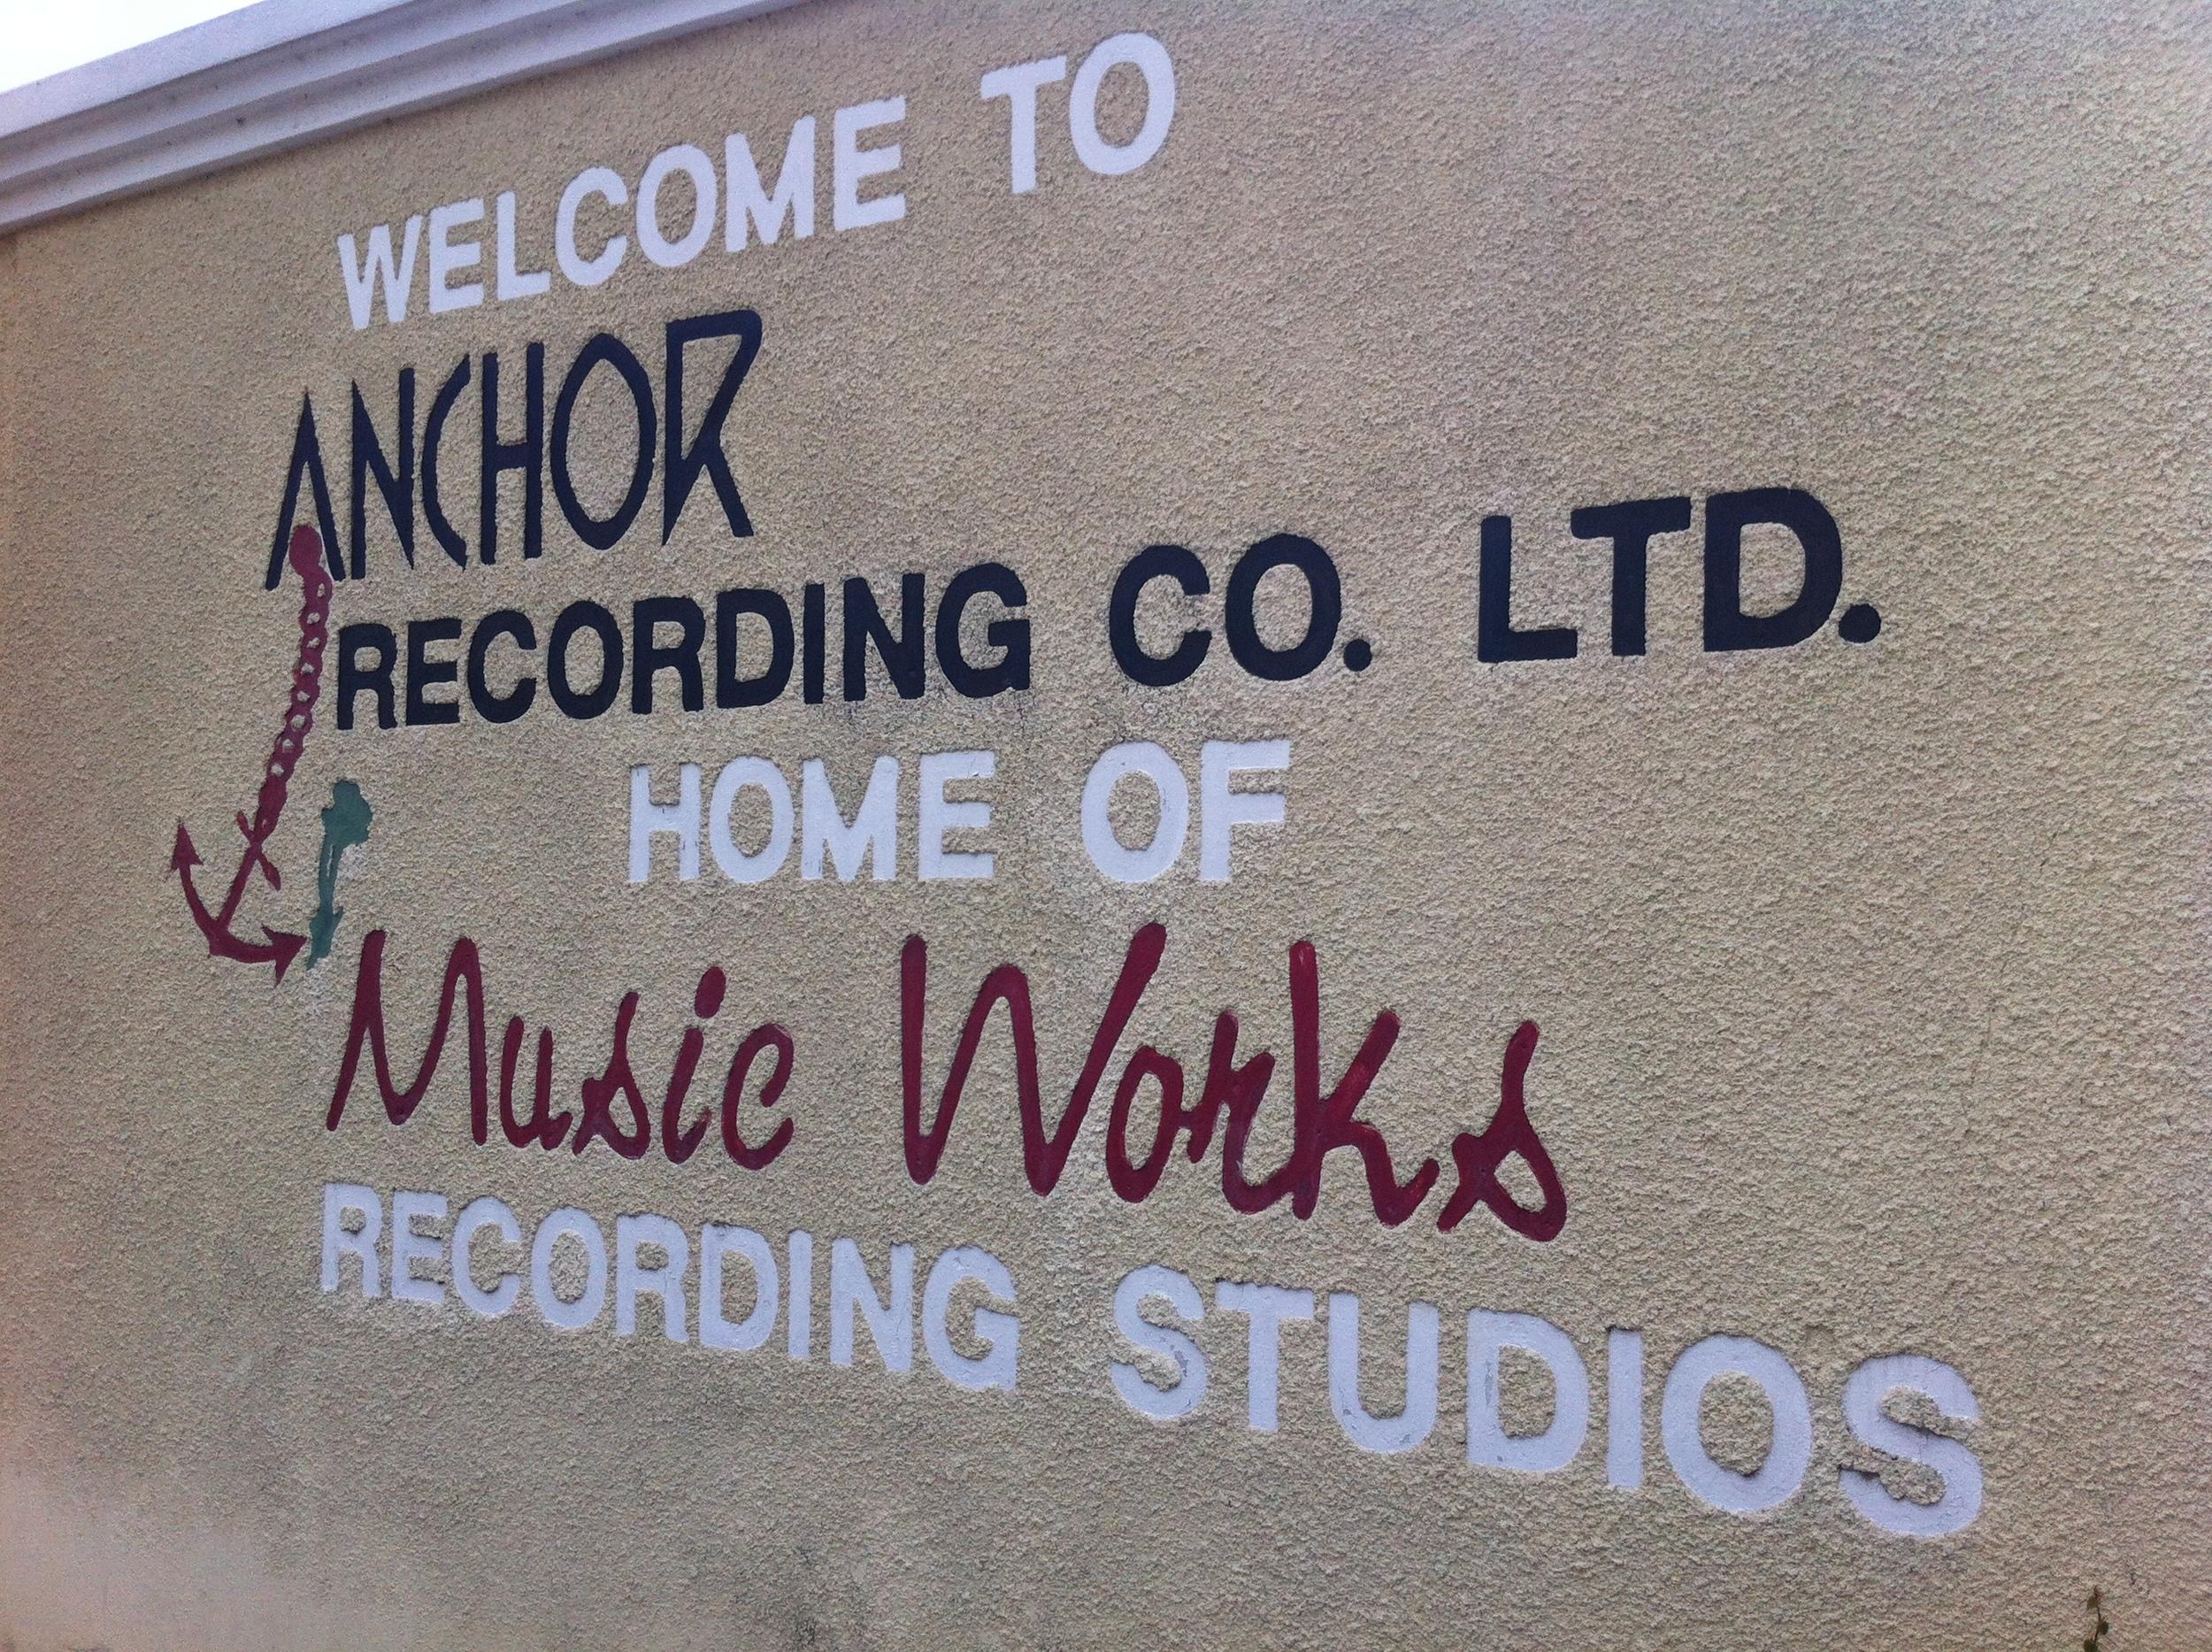 Anchor Studio, Kingston, Jamaica